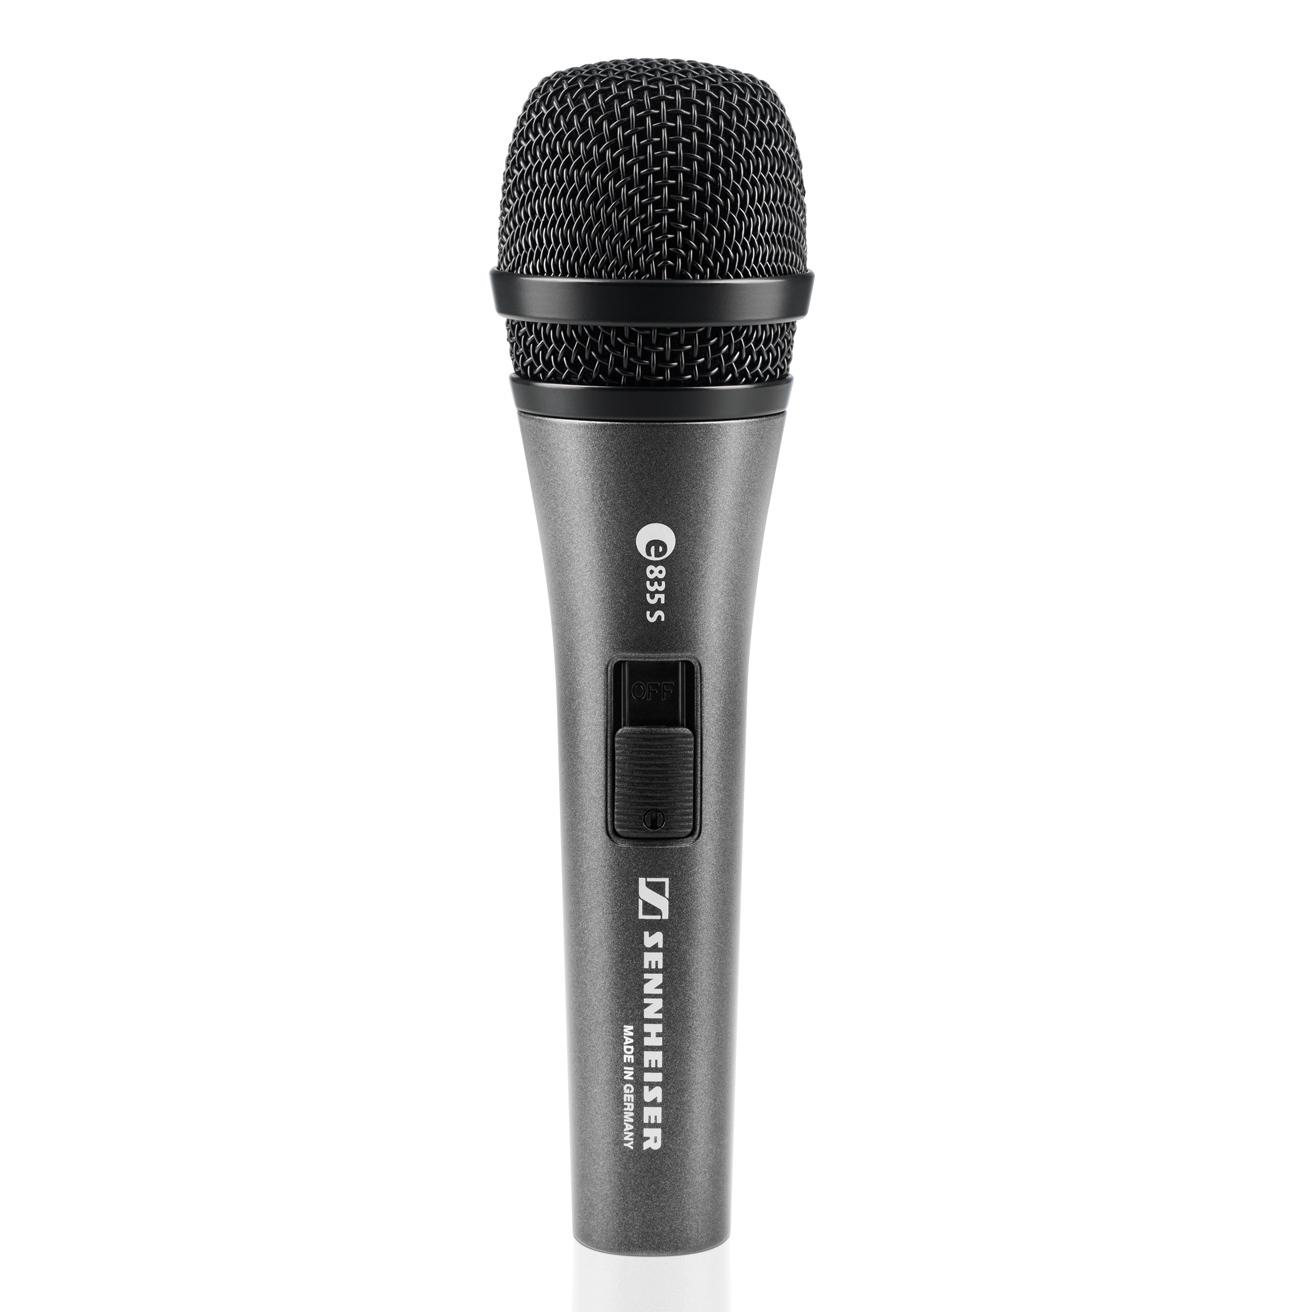 Sennheiser E825S Cardioid Handheld Dynamic Vocal Microphone W/ Switch